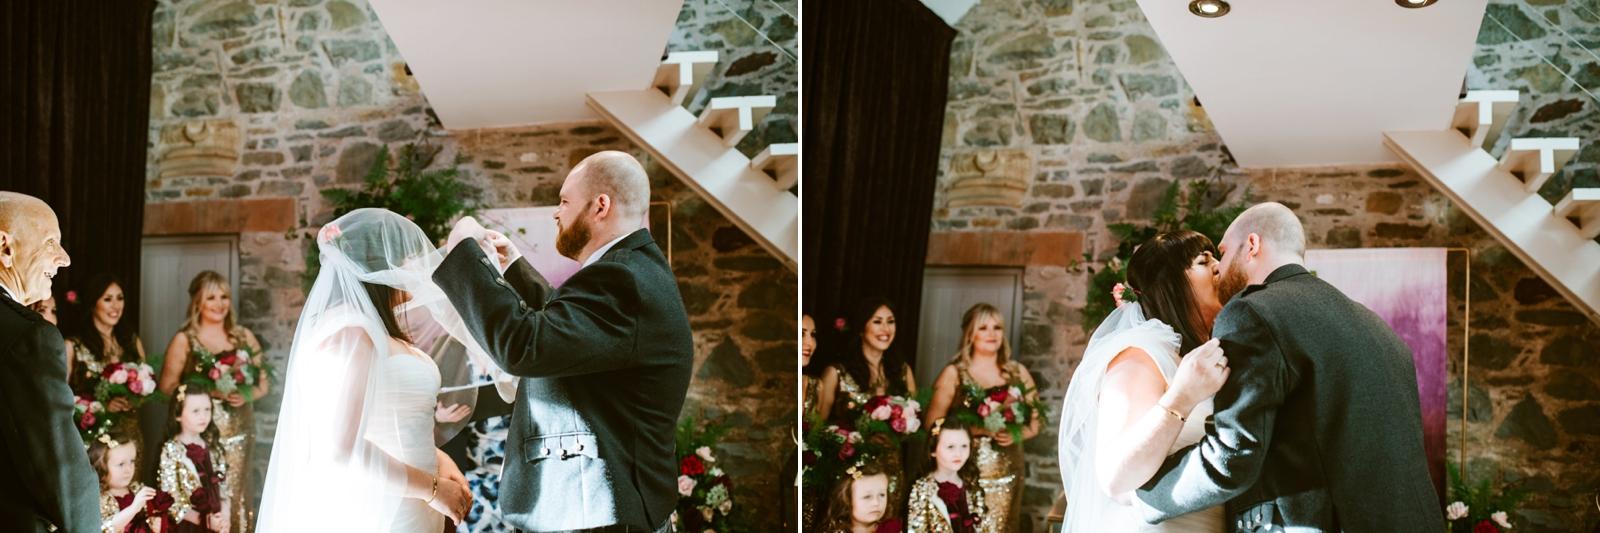 alternative-wedding-photography-scotland-katie-stephen-aikwood-tower-203.jpg